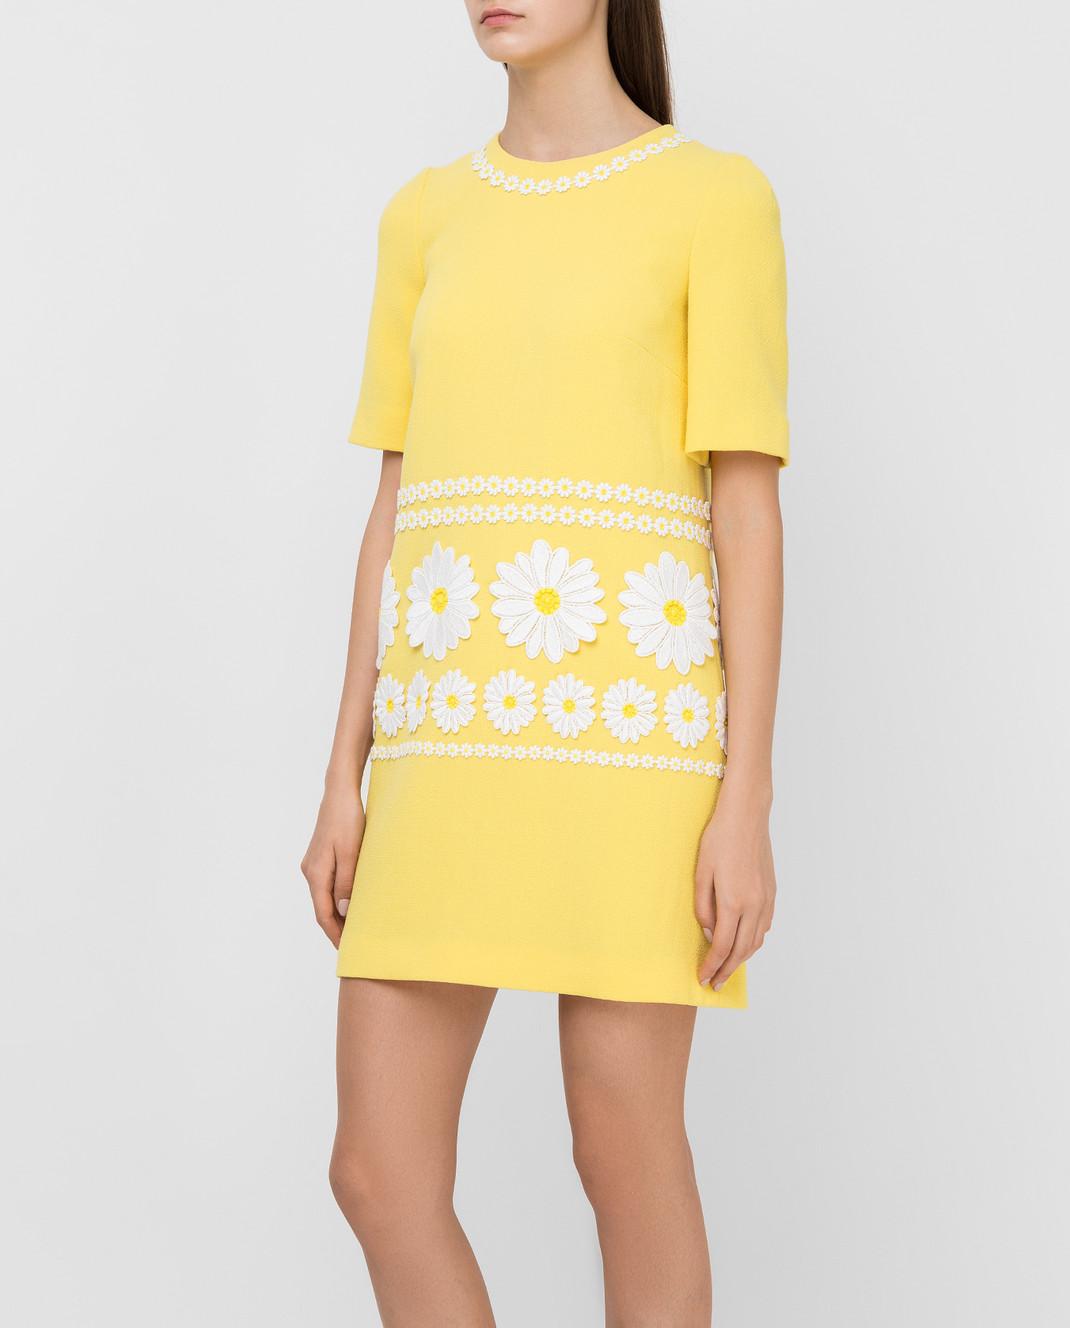 Dolce&Gabbana Желтое платье из шерсти F6UL3ZFU2TZ изображение 3